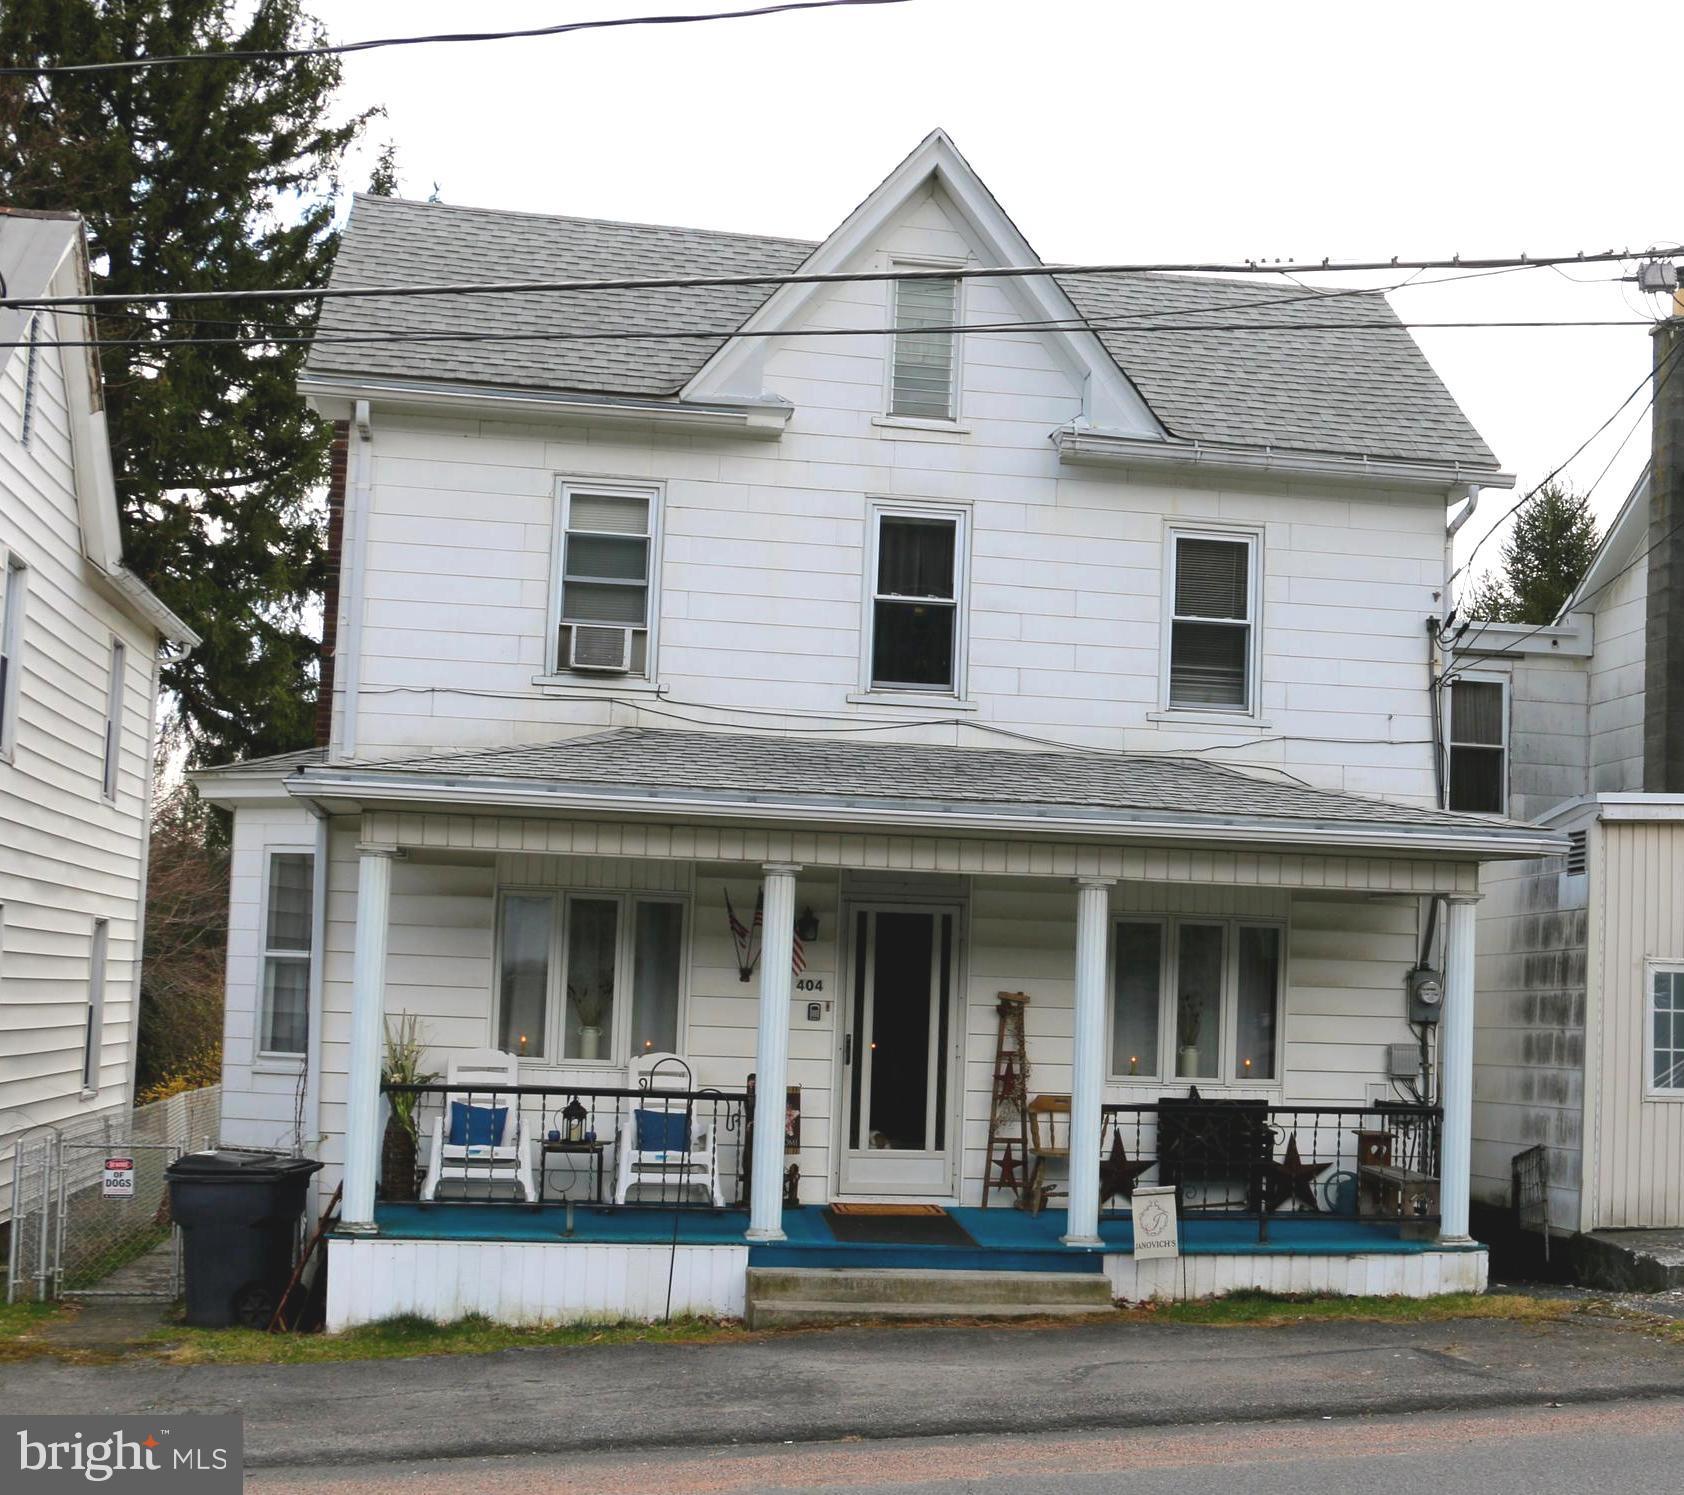 404 MAIN STREET, LAVELLE, PA 17943